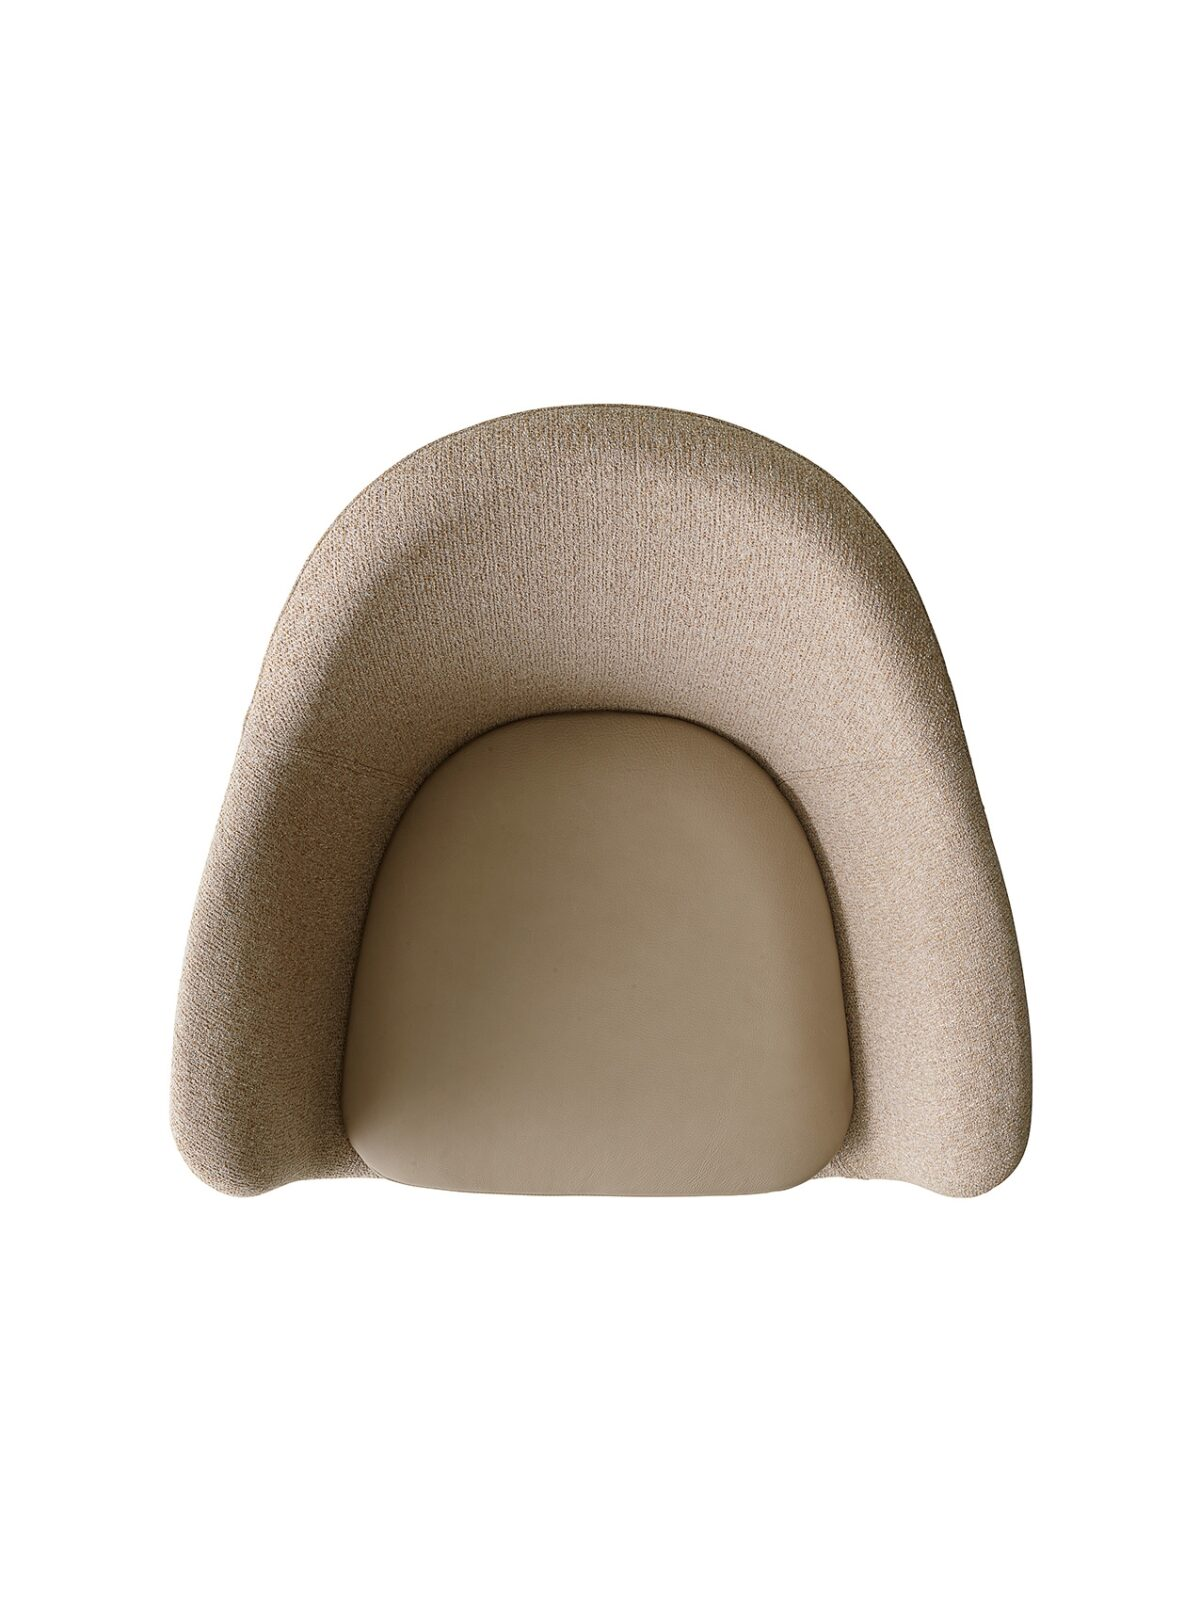 9255159 Harbour ounge Low back Natural oak Savanna 222 Nuance light grey cushion top